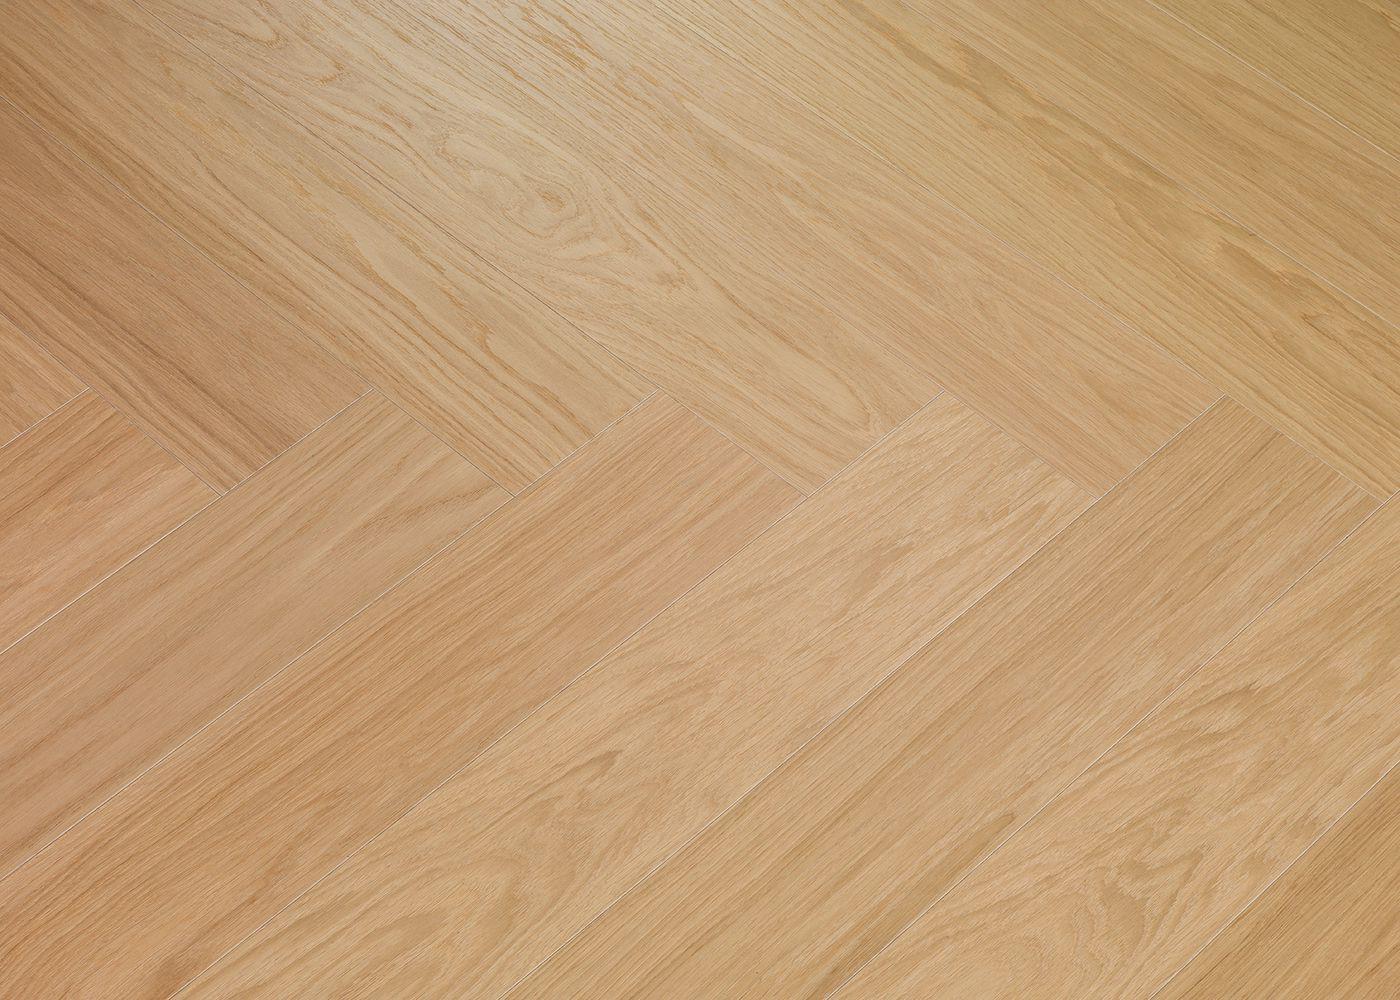 Sol plaqué bois chêne Côme Bâton rompu brossé vernis mat - Swing - Select 10x121x595 Lame Gauche